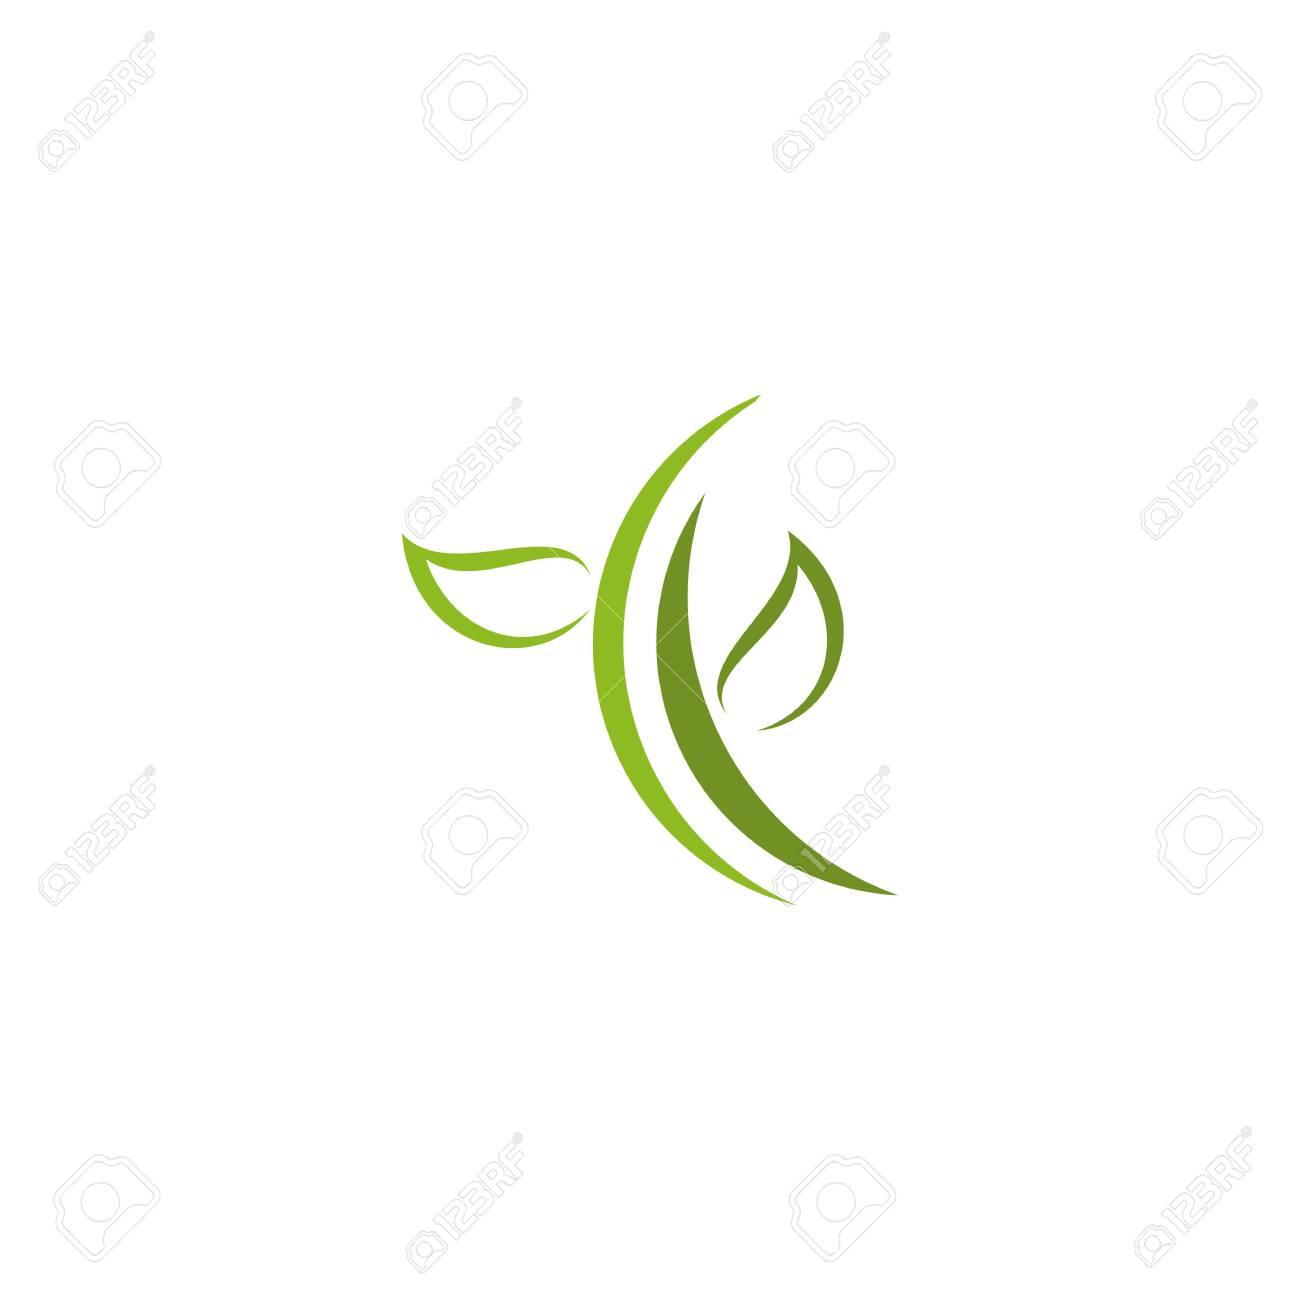 Eco green leaf icon logo design inspiration vector template - 134008458